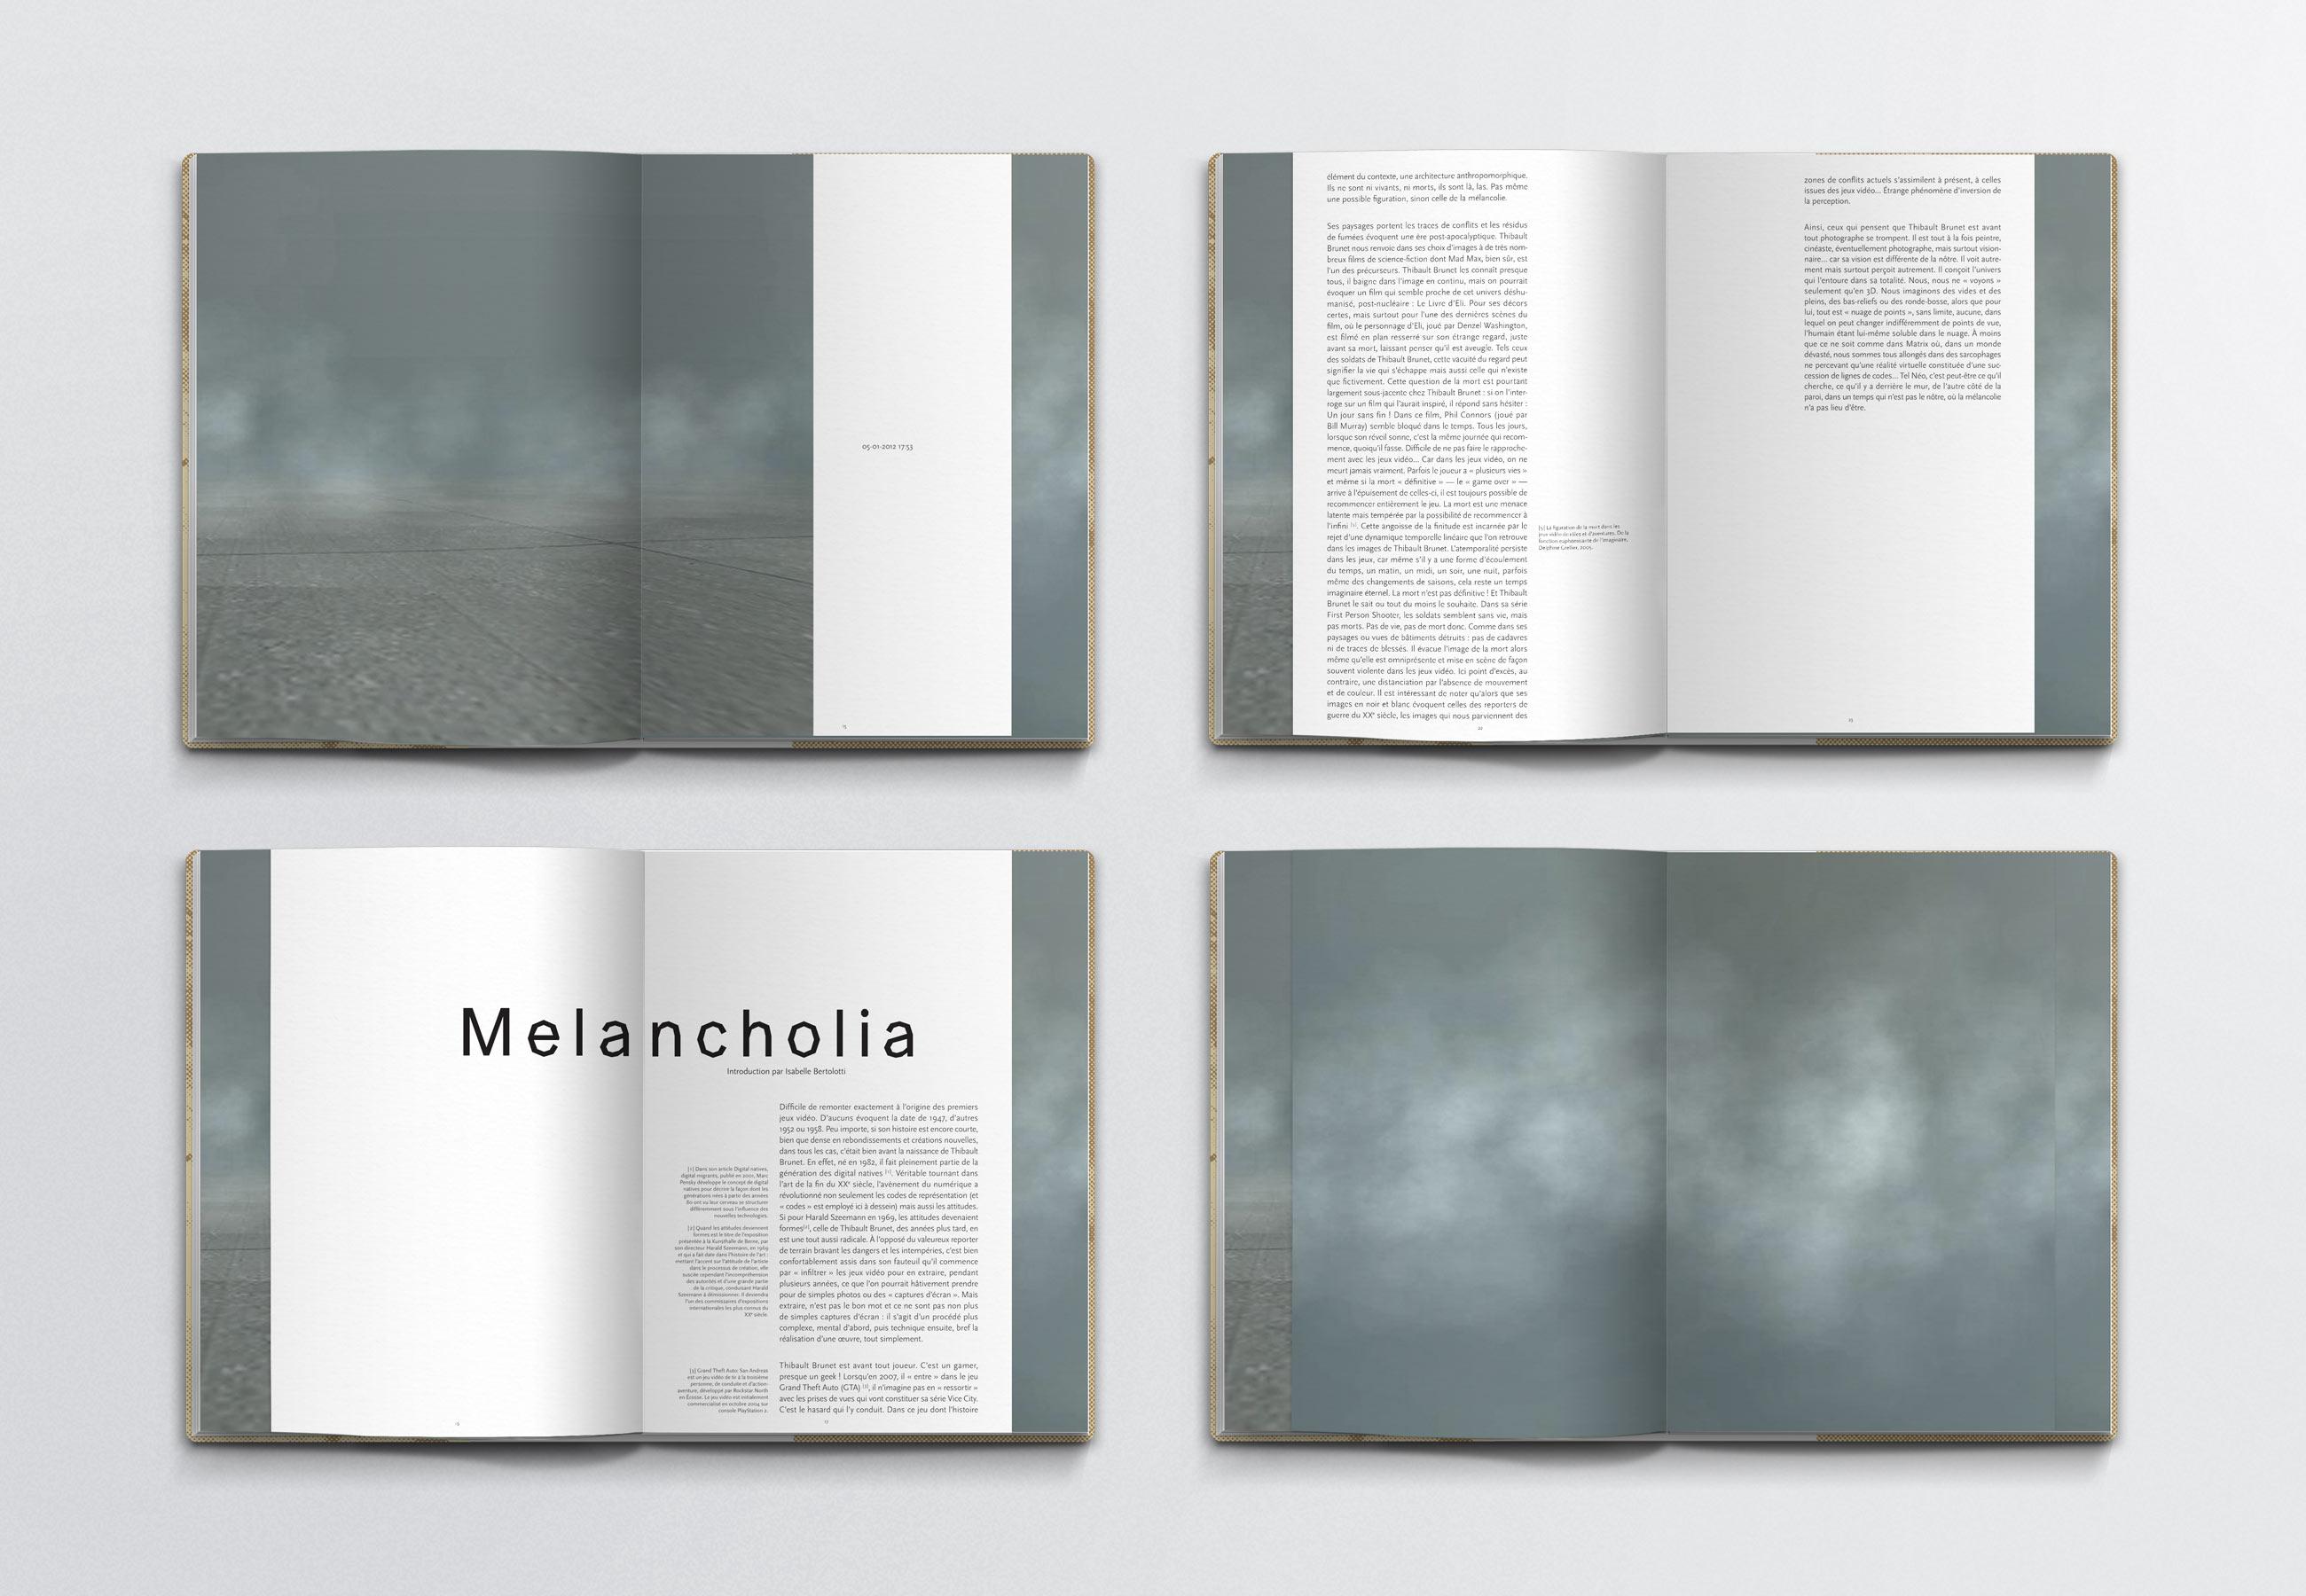 melancholia_parallelegraphique_b